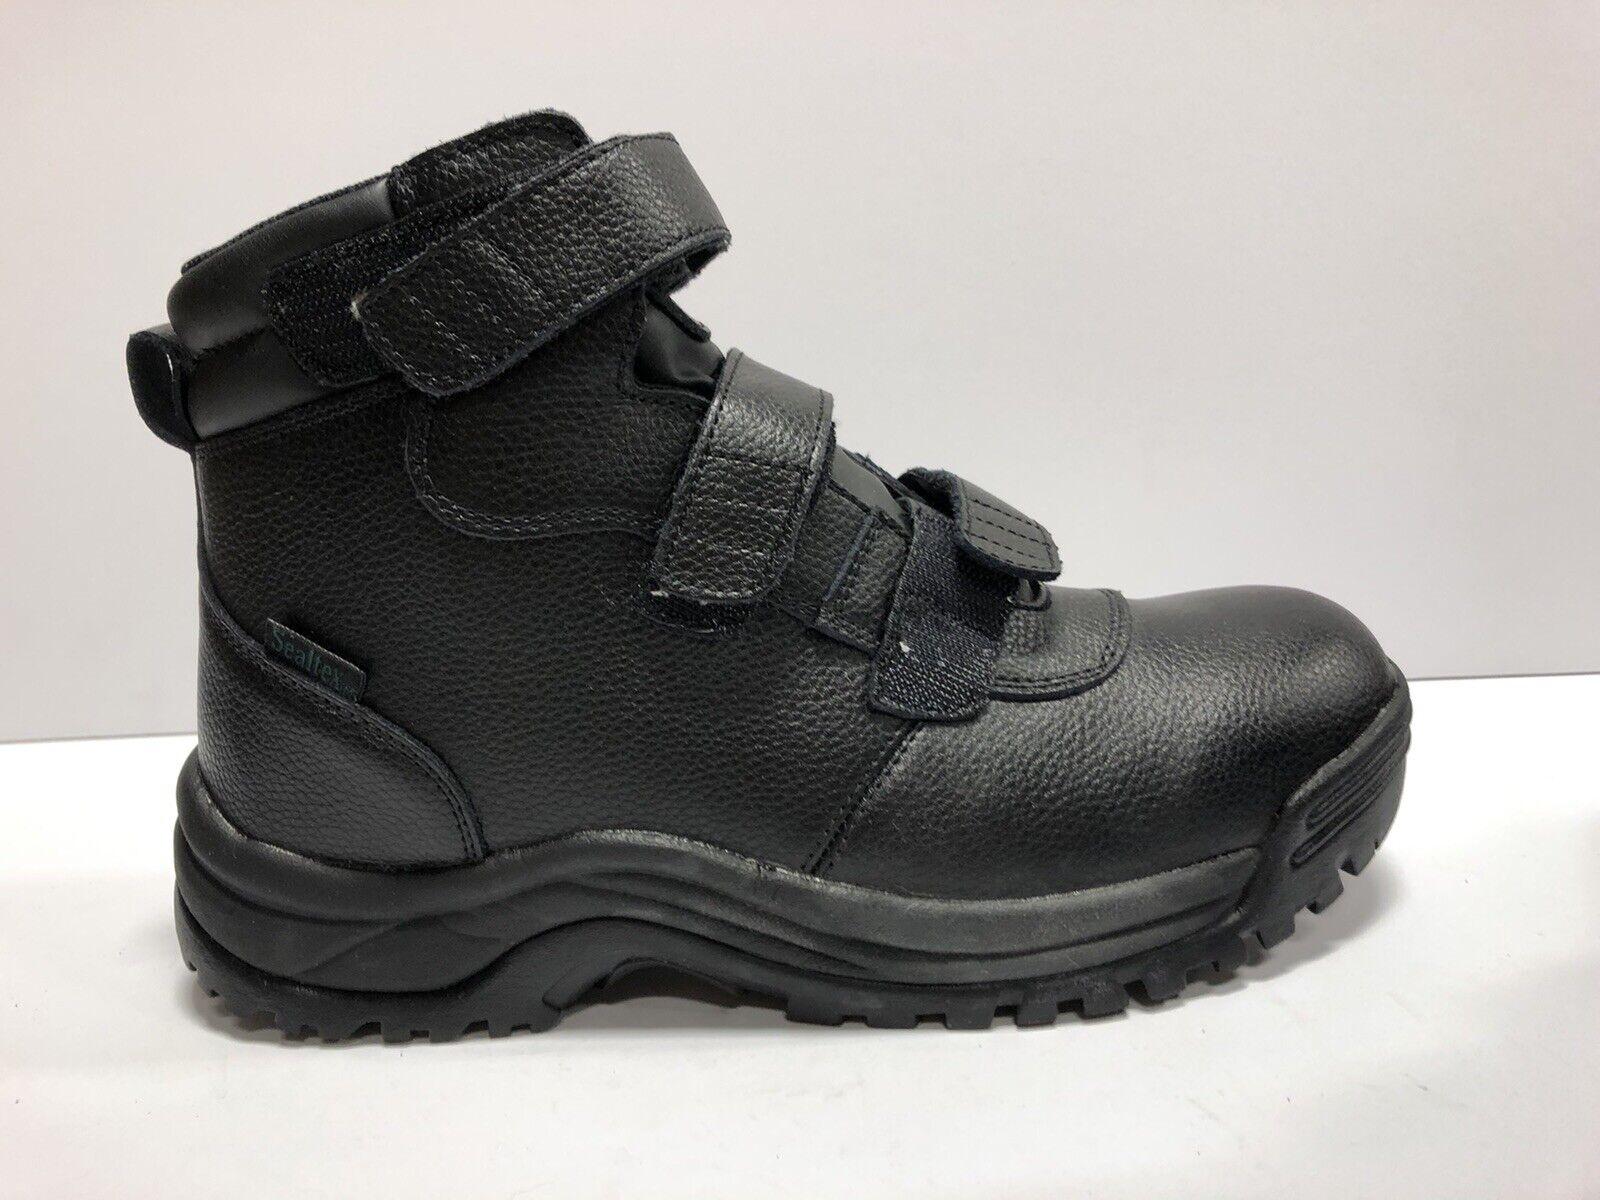 Propet, Cliff Walker Tall Strap Mens Boot Black 9.5 EEEEE